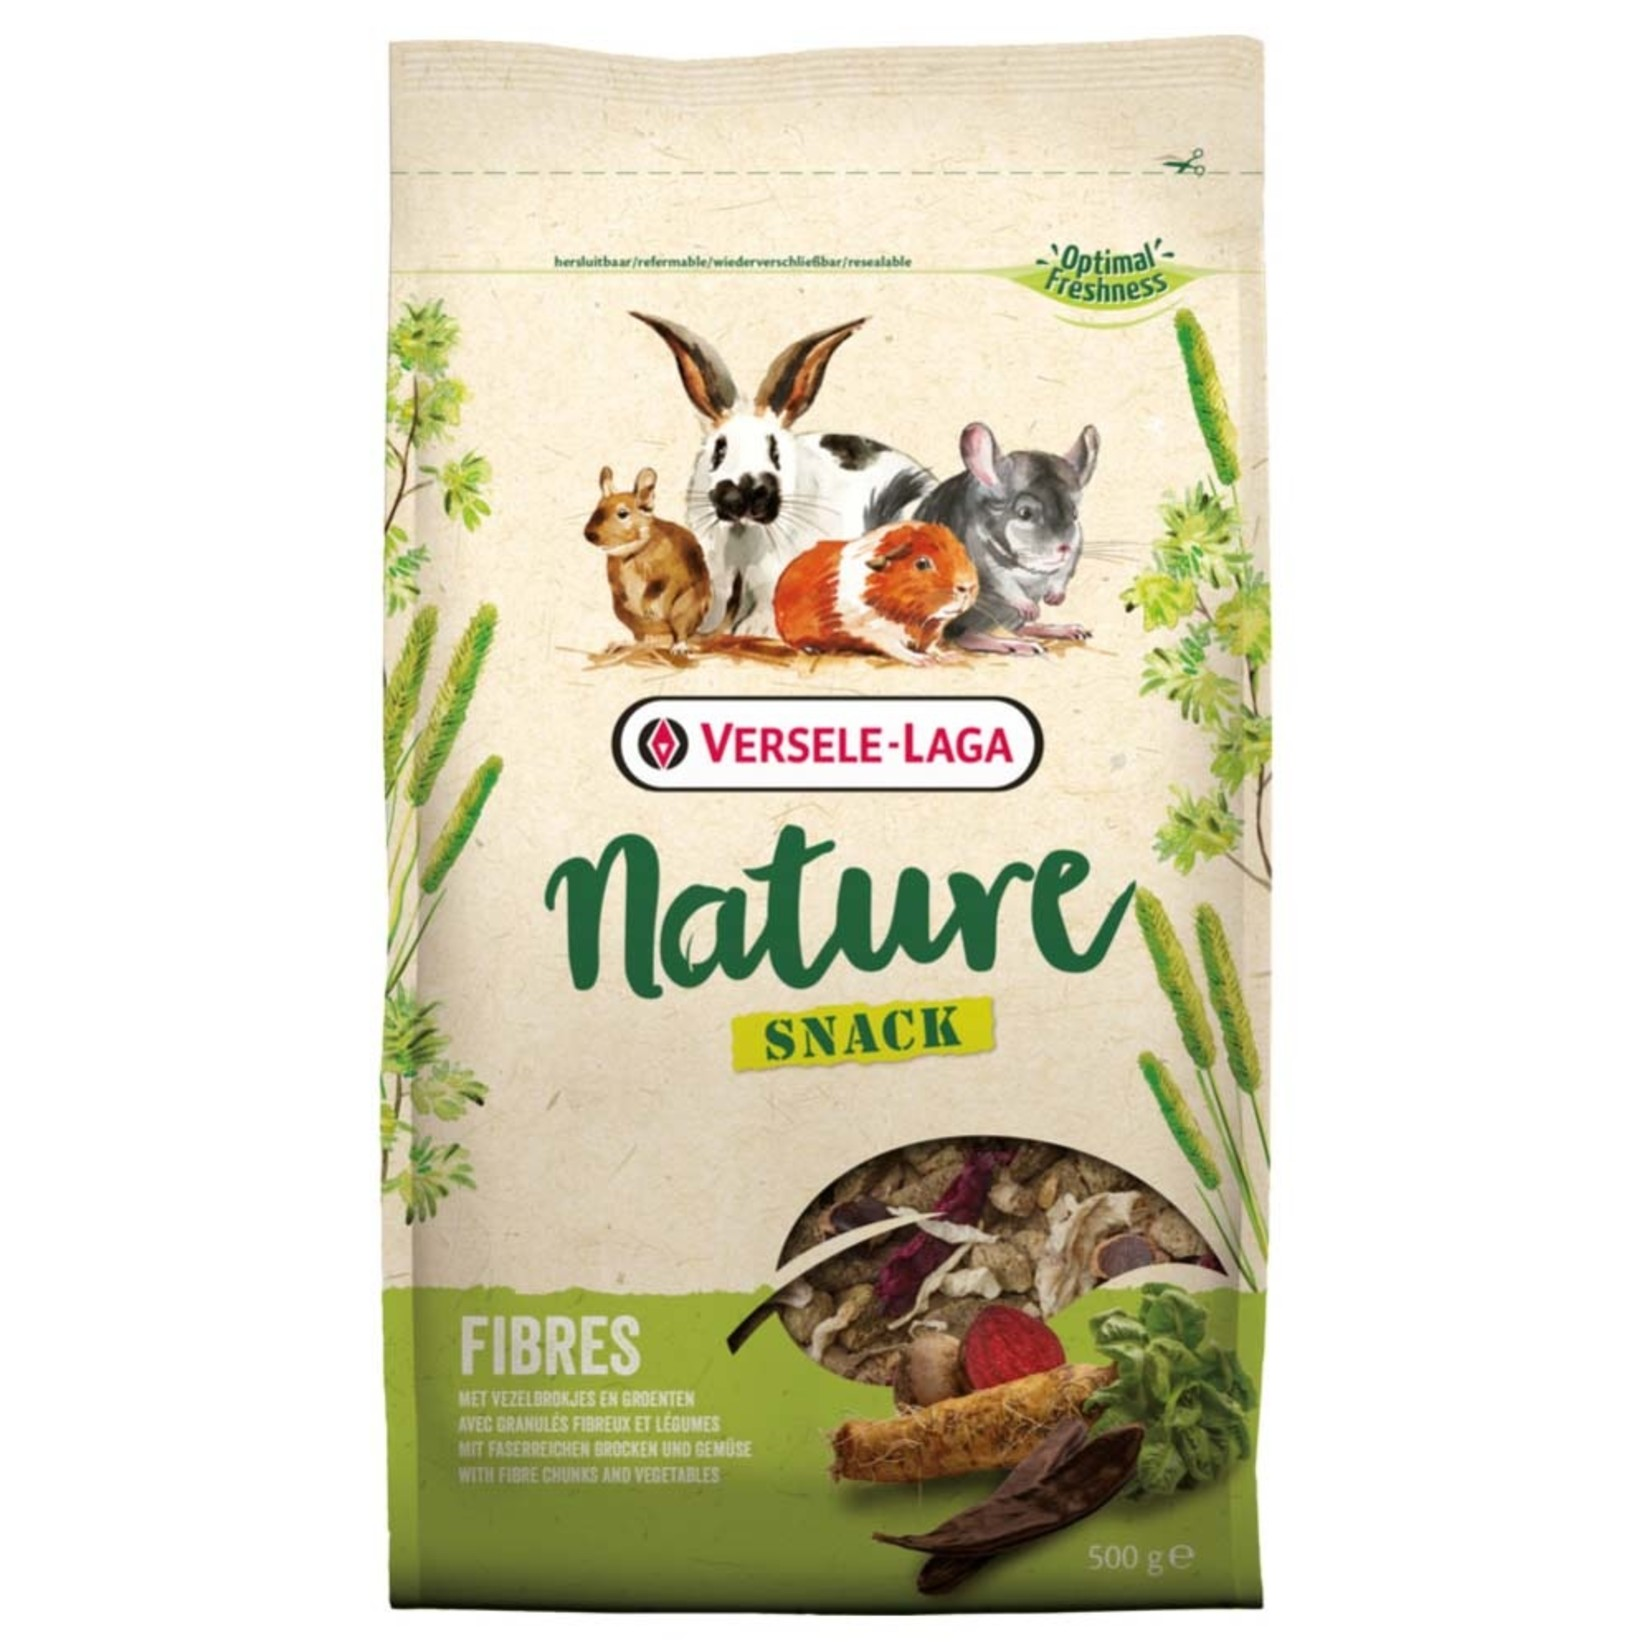 Versele-Laga Nature Snack for small animals 500g Fibers